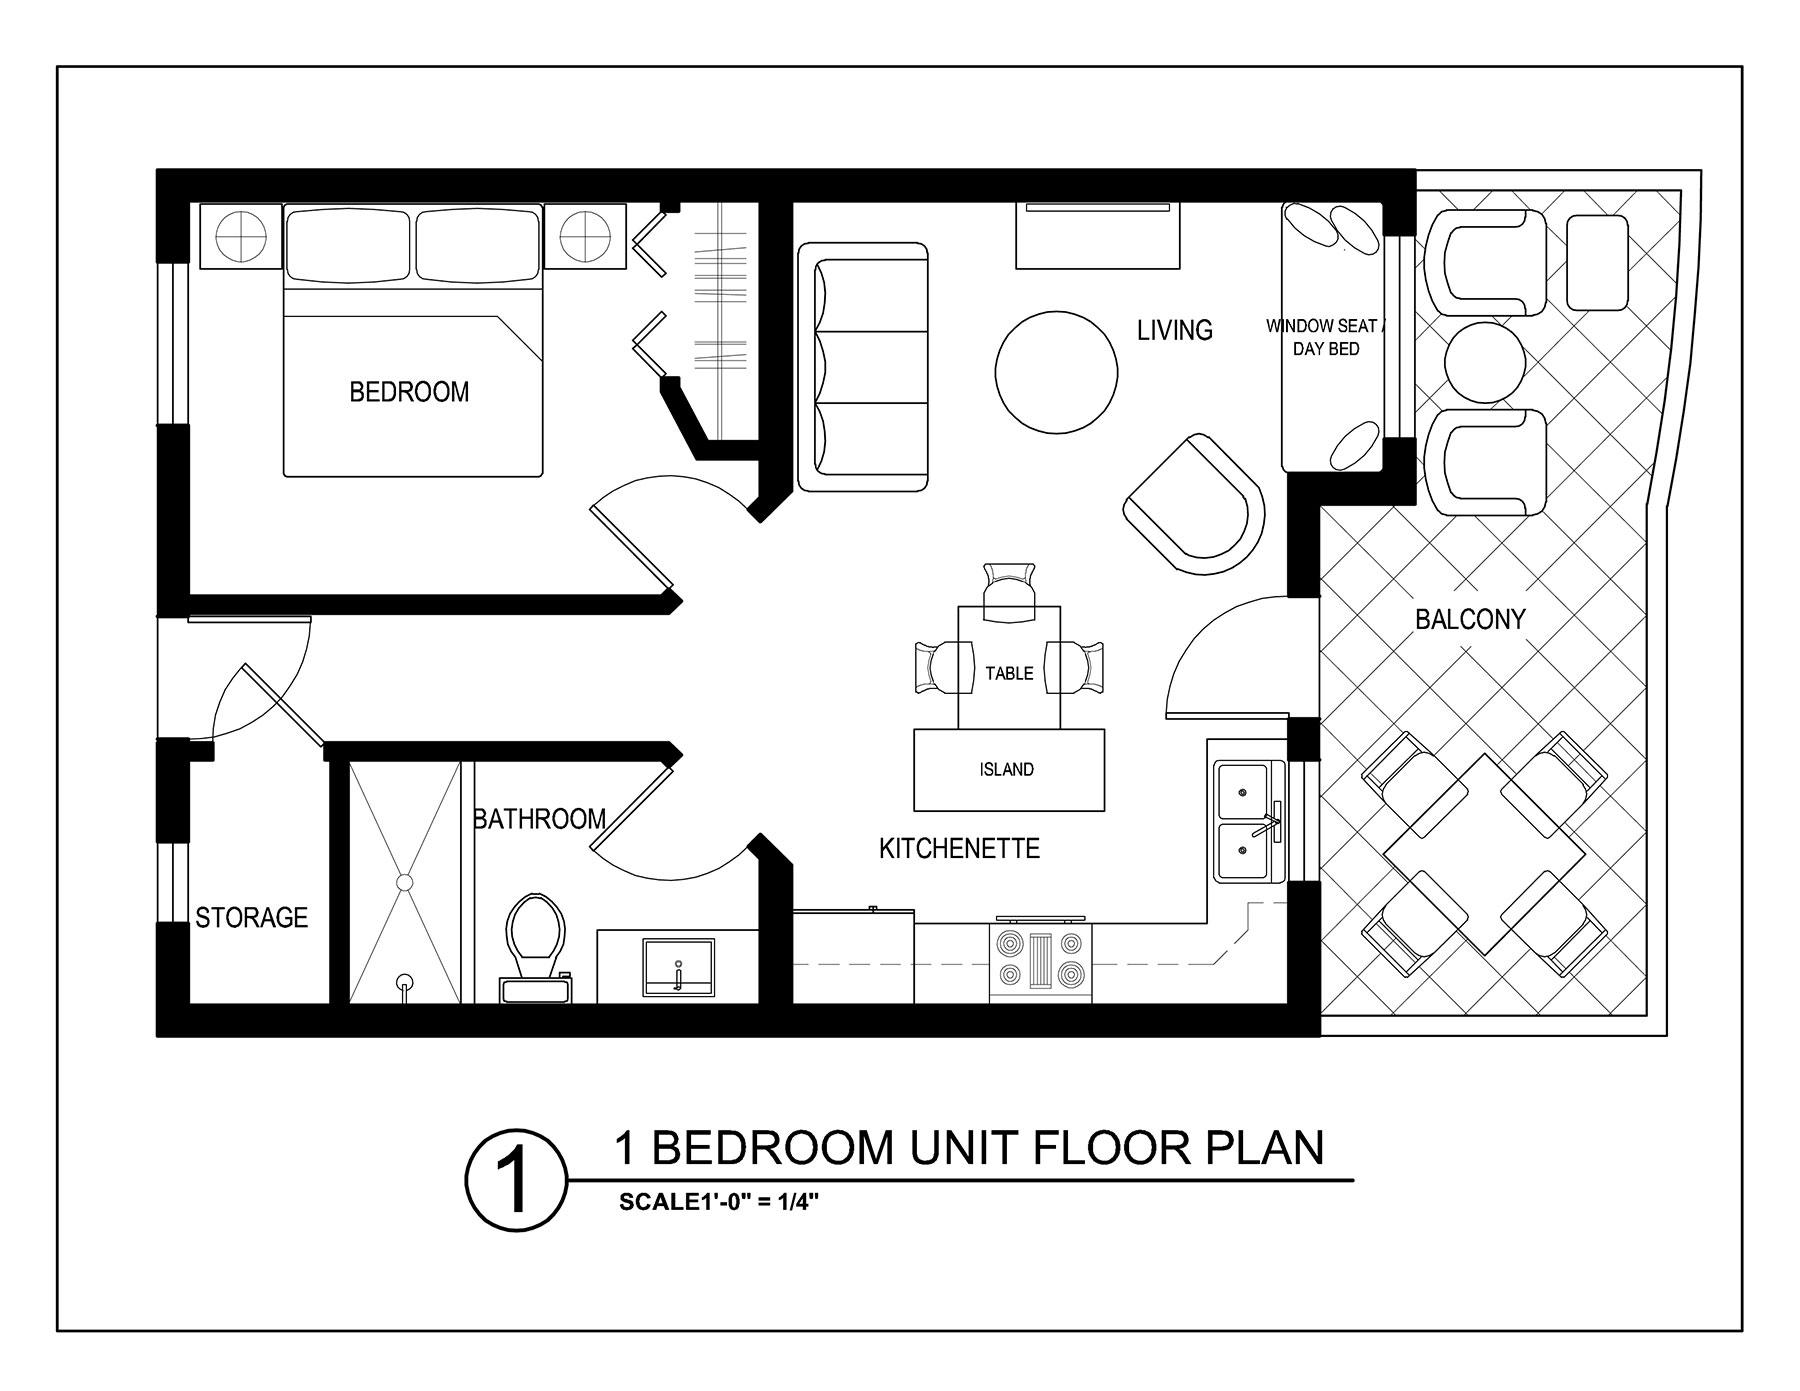 One-Bedroom-Unit-Floor-Plan.jpg